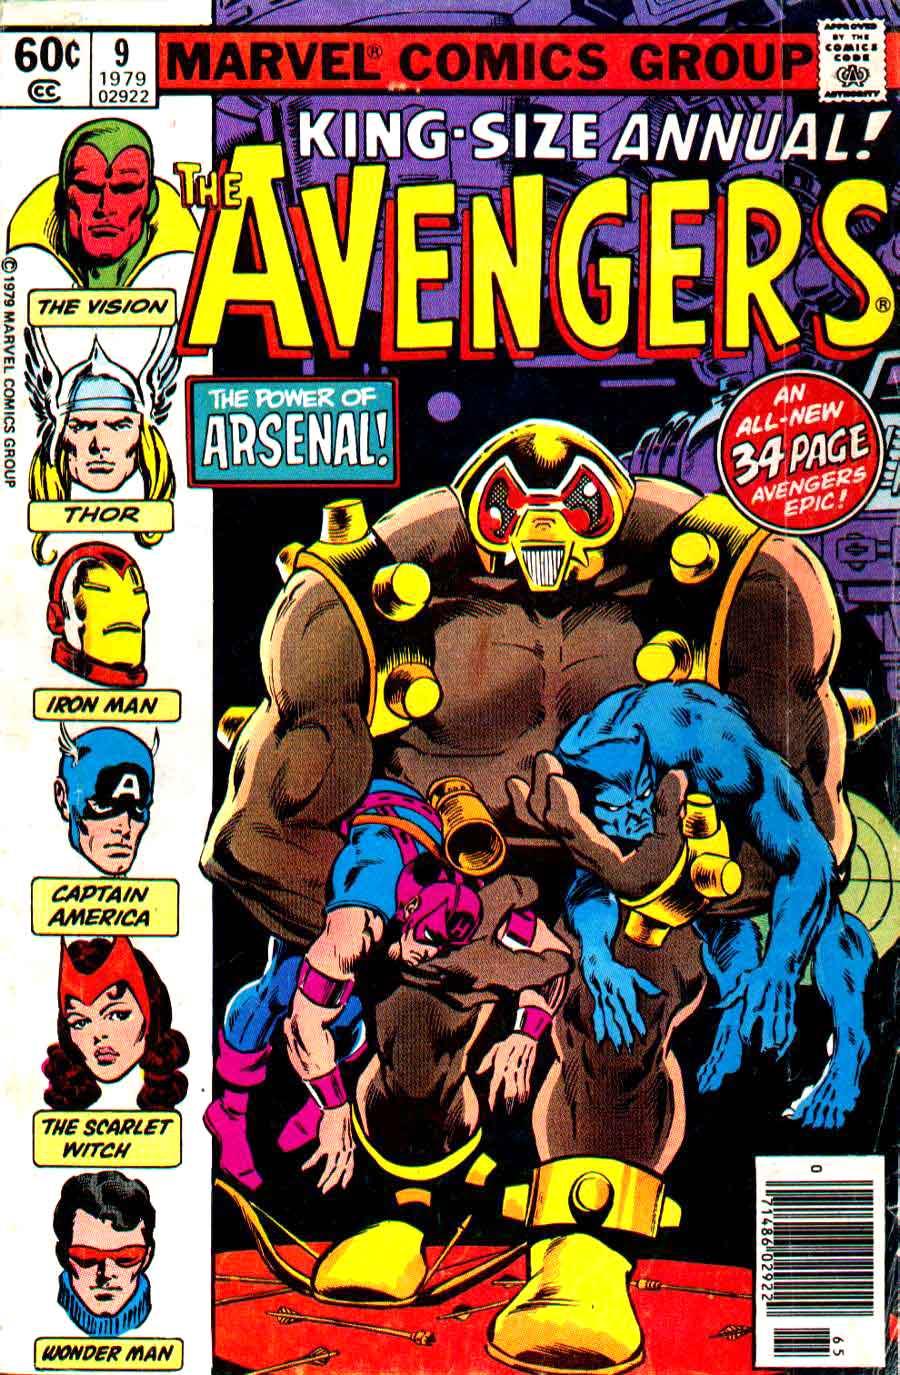 Avengers Annual V1 9 Marvel Comic Book Cover Art By Don Newton